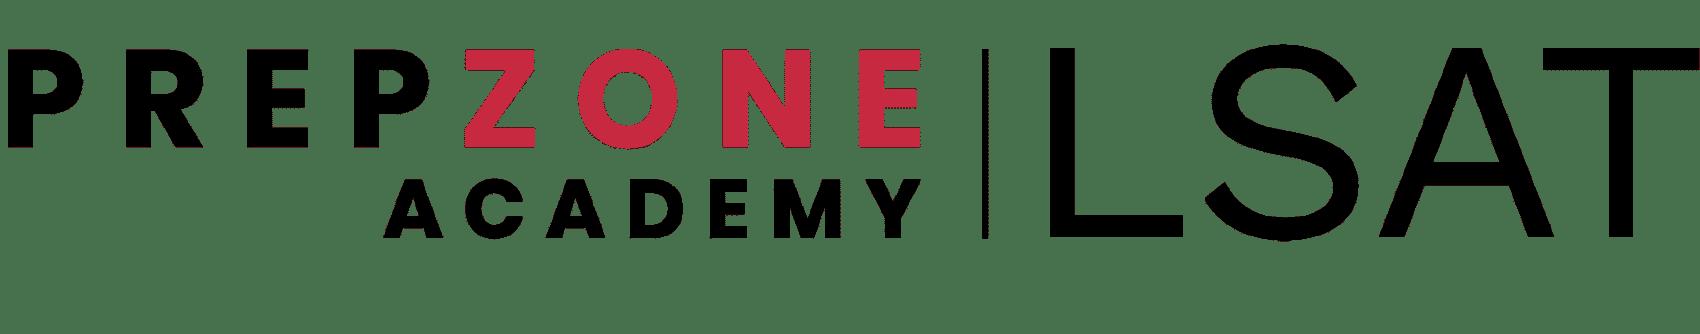 Prep Zone Academy | LSAT